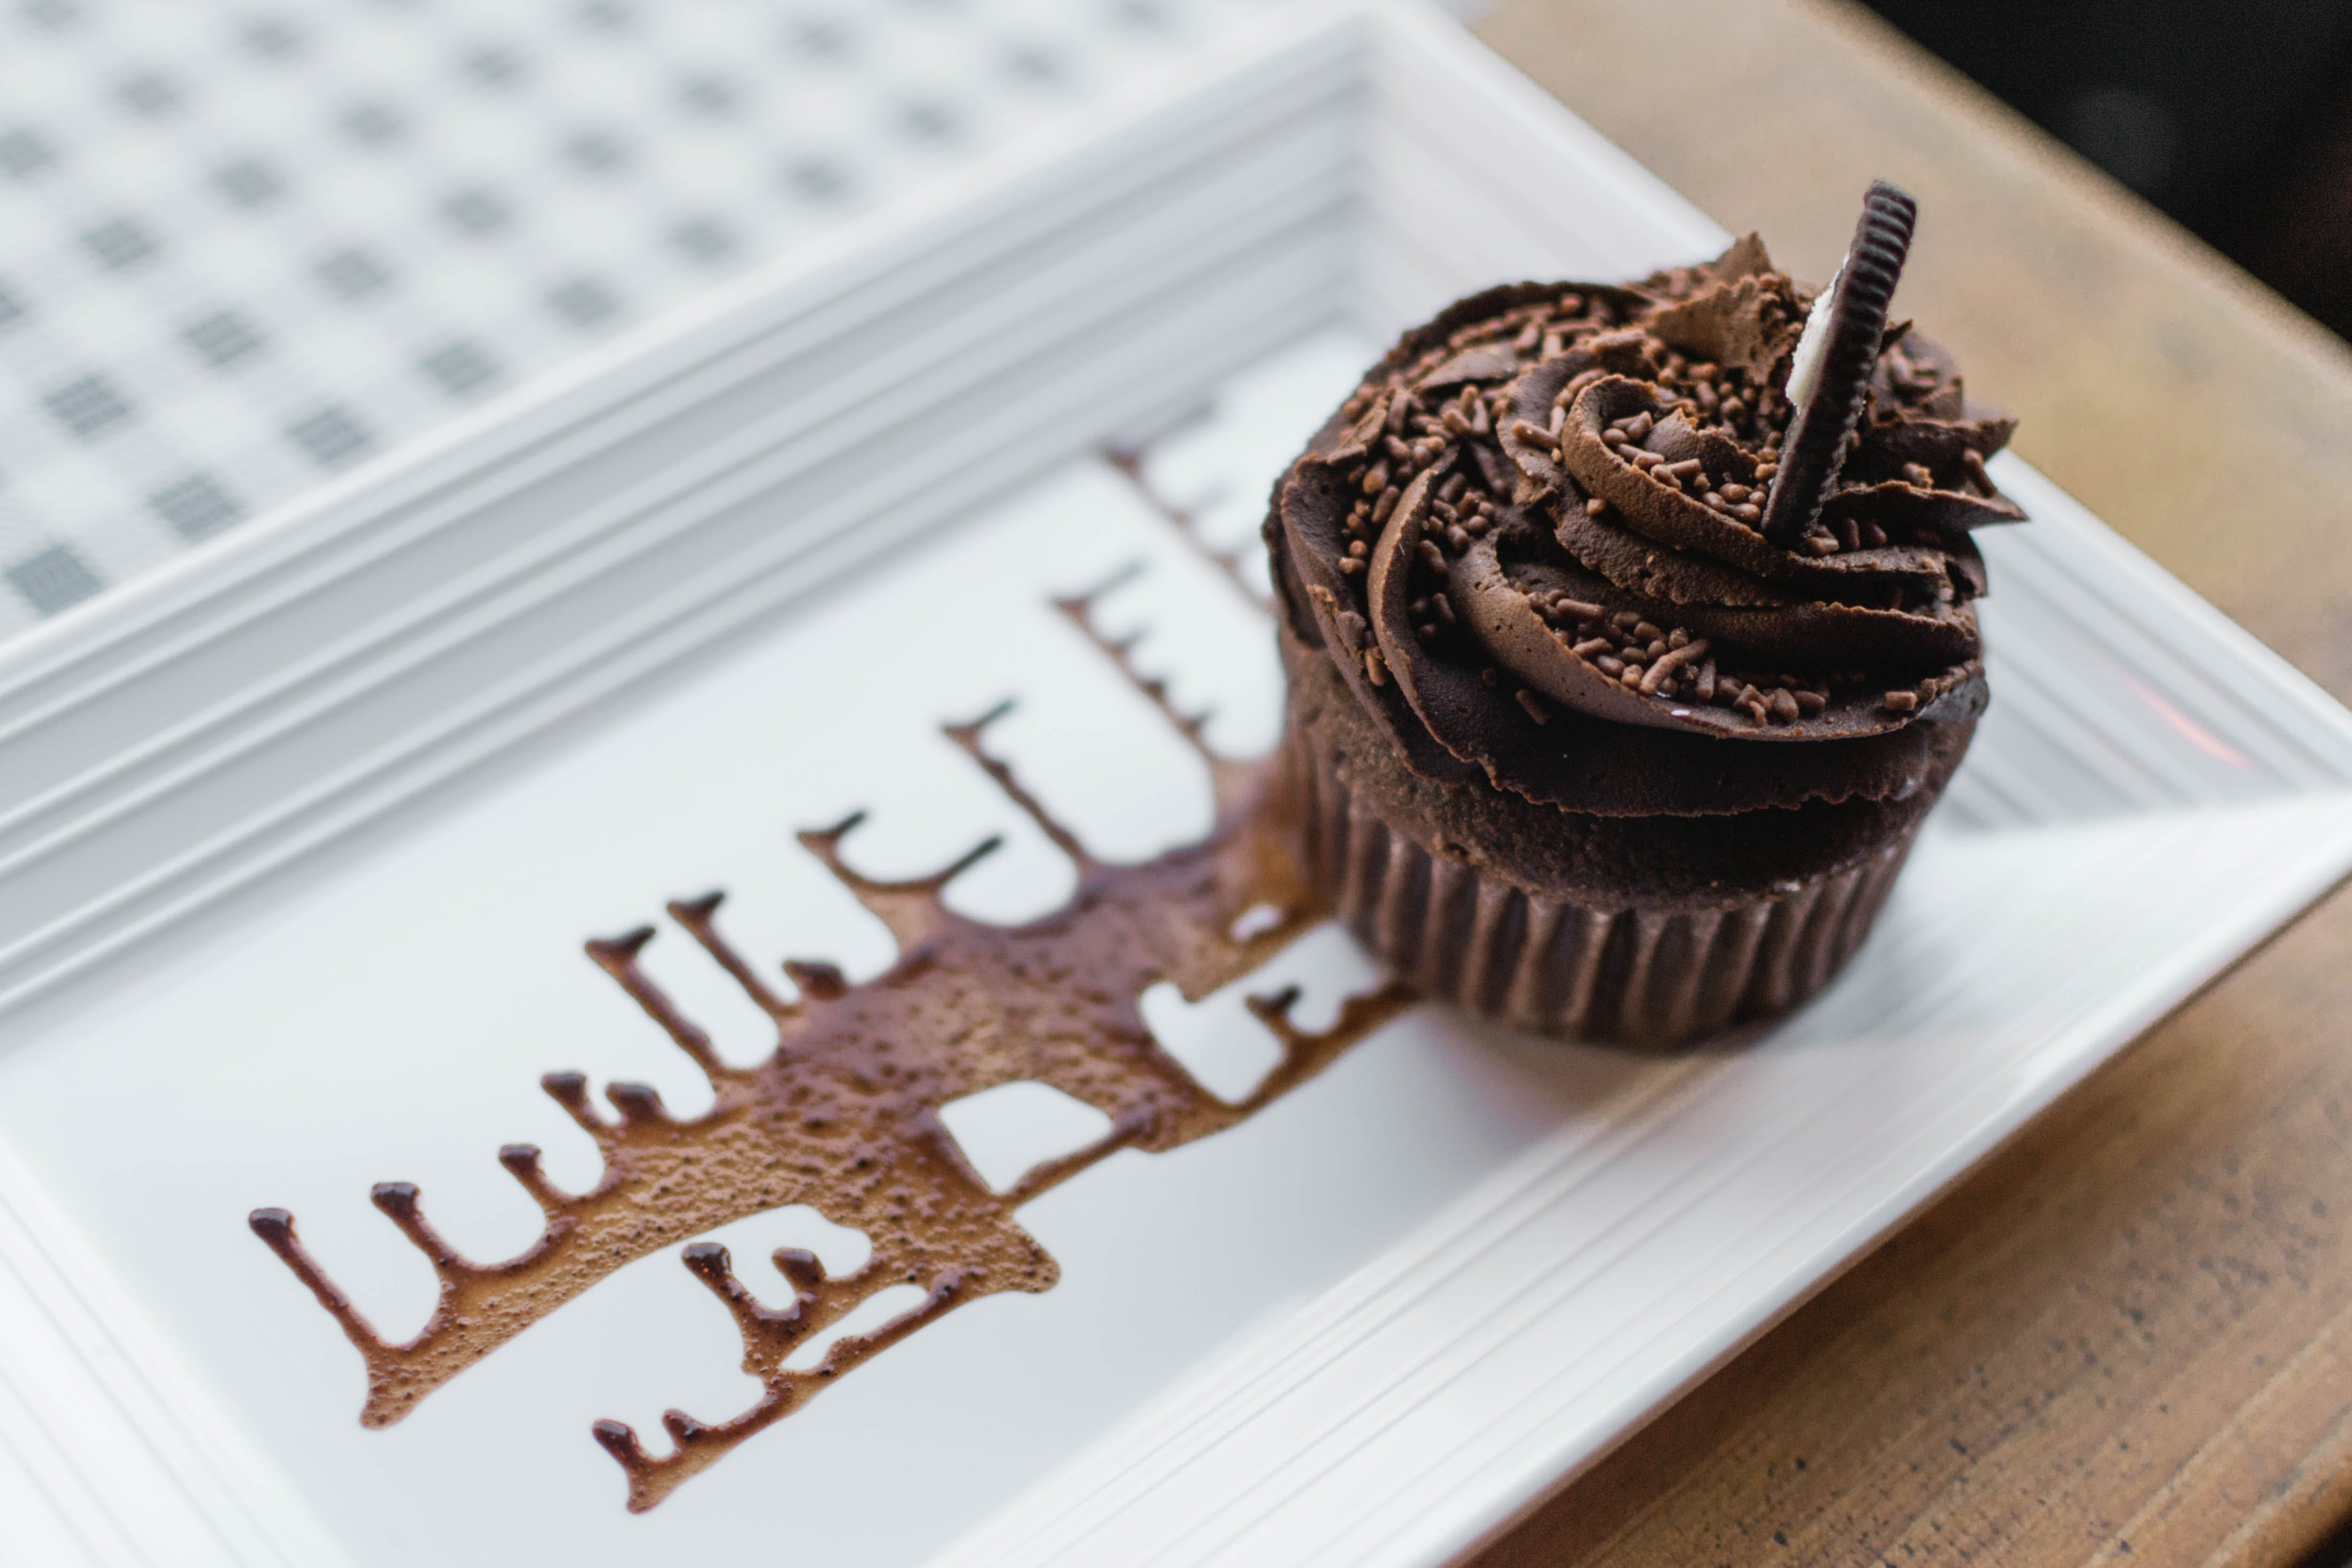 Chocolate Cupcake on Rectangular White Ceramic Plate